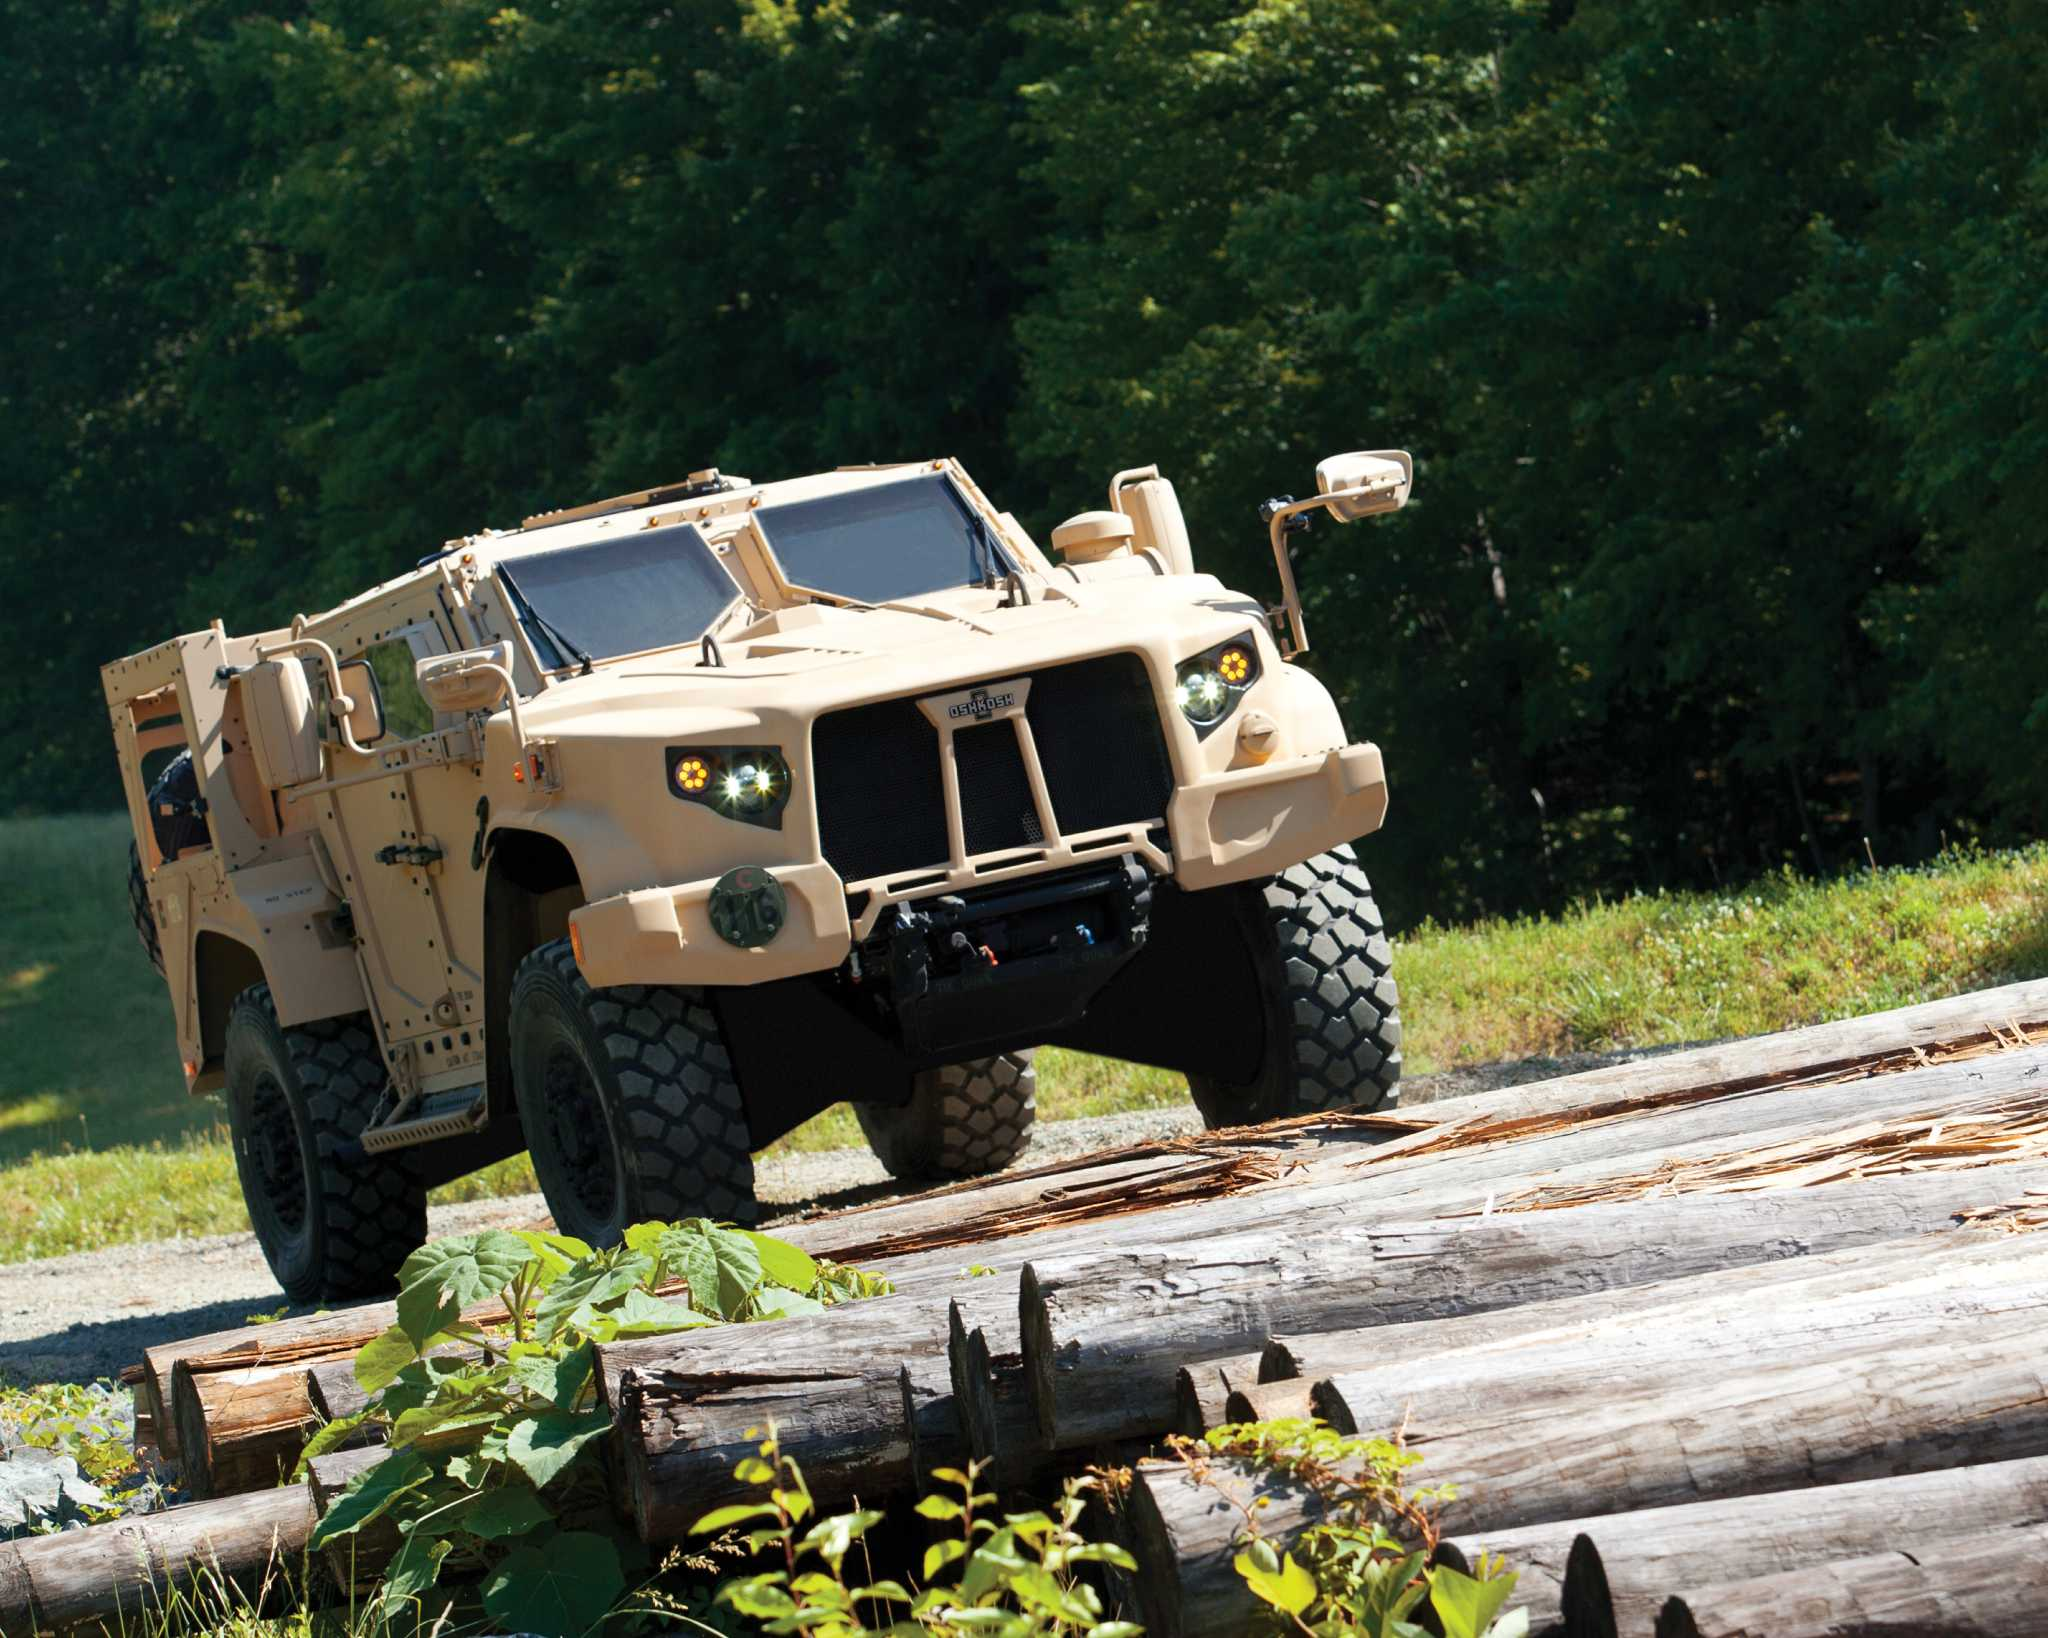 The Pentagon's newest vehicle, L-ATV